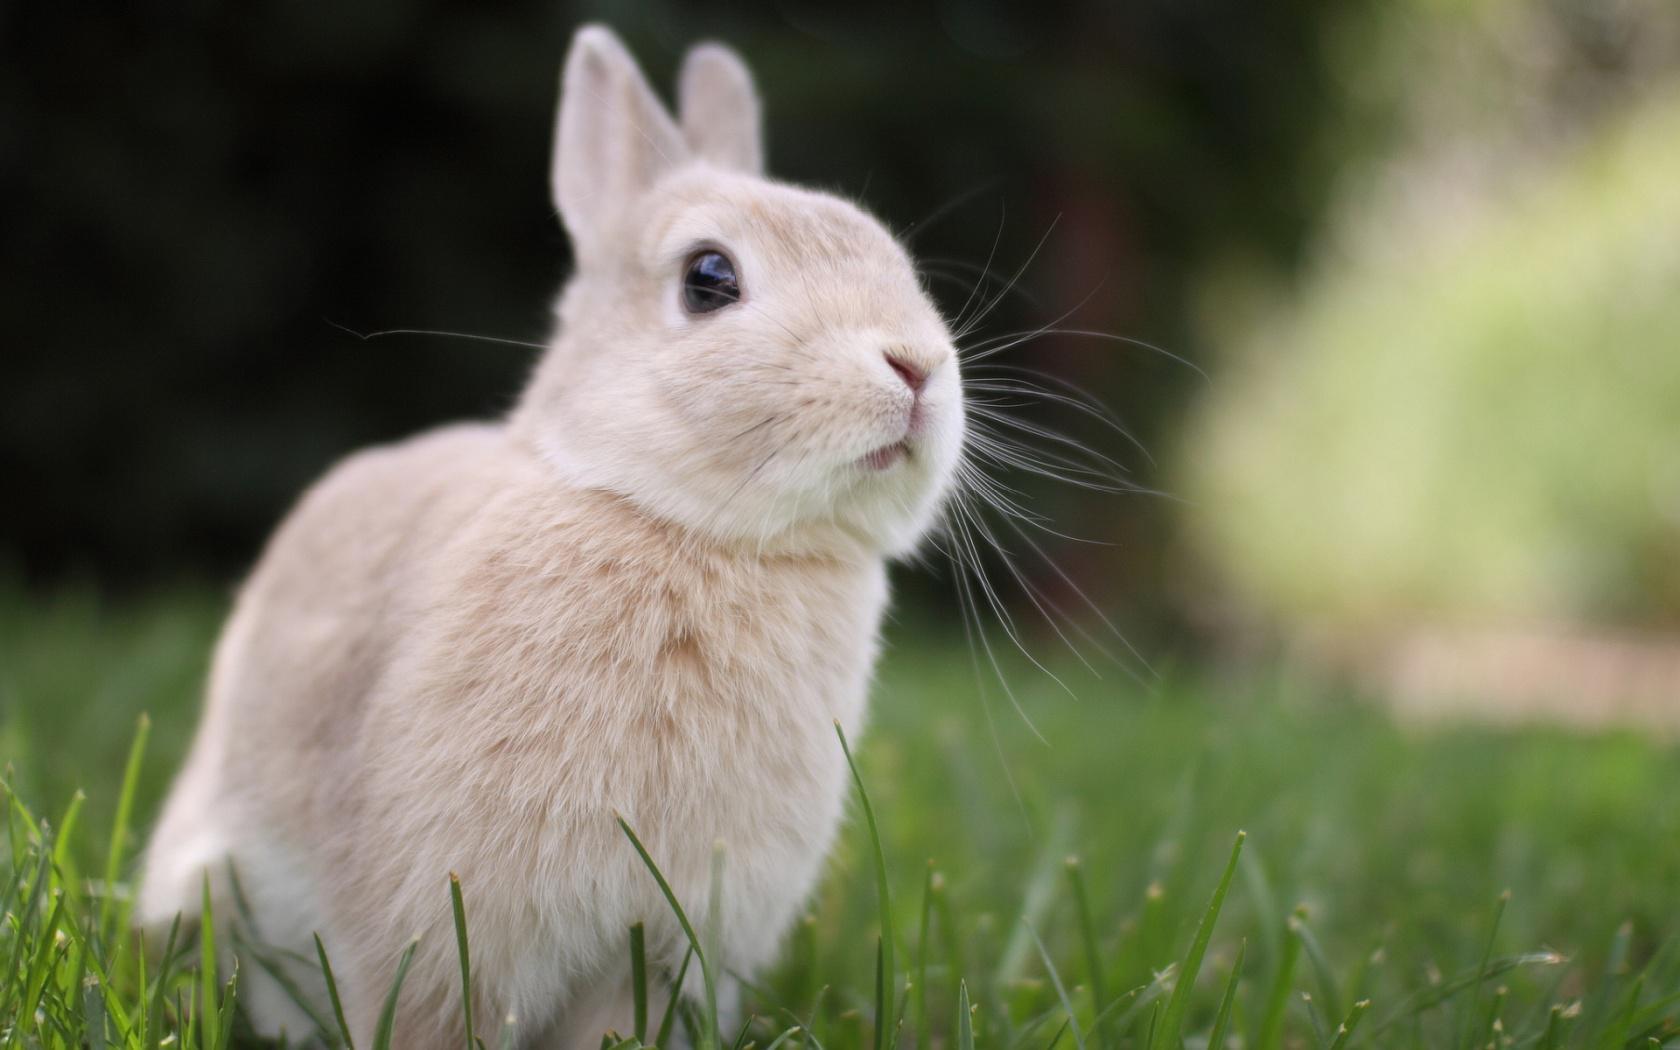 Cute White Baby Rabbits Wallpapers Hd Bunny Rabbit Cute Free Desktop Wallpaper Download